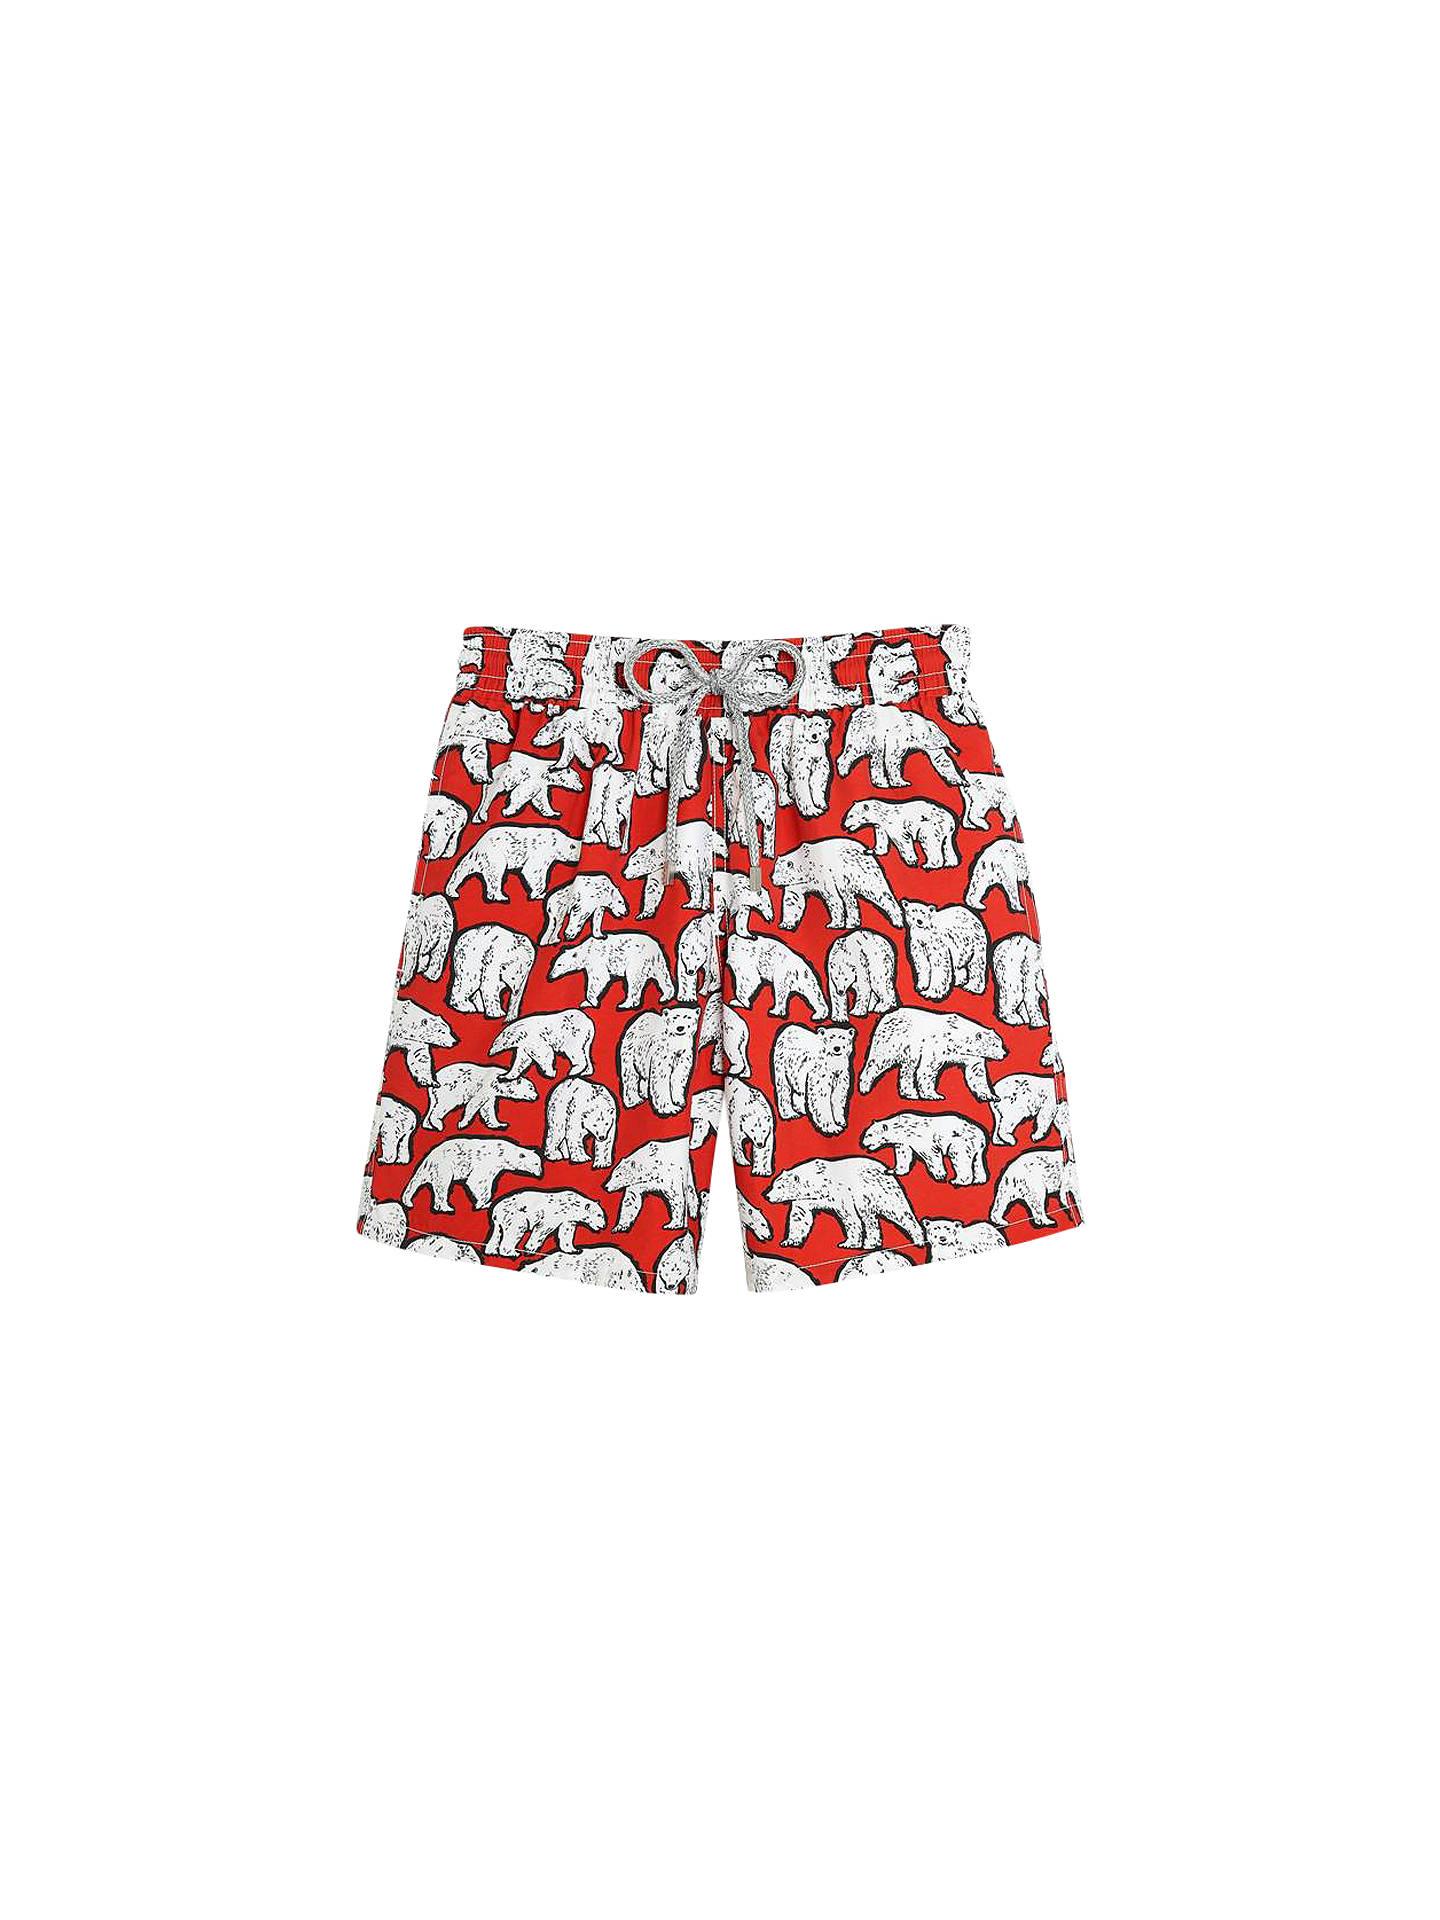 efe40d697f Buy Vilebrequin Polar Bear Print Swim Shorts, Red/White, L Online at  johnlewis